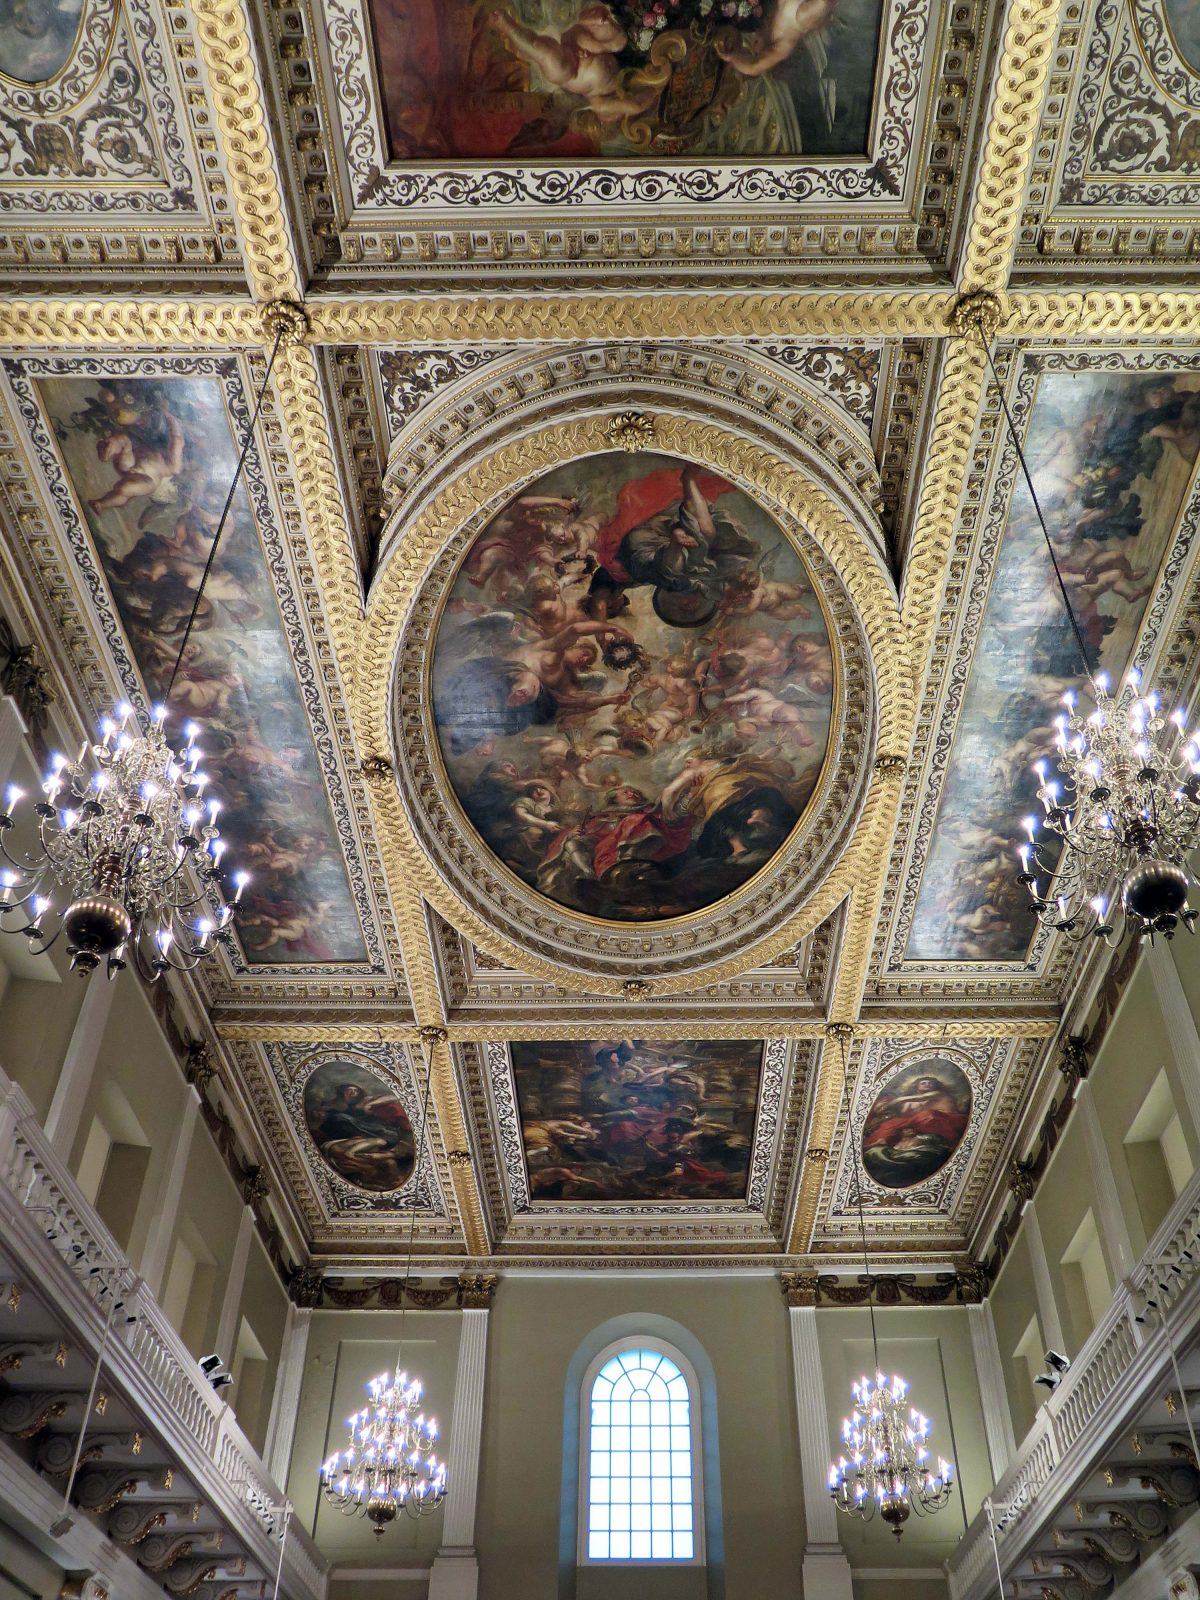 The Peter Paul Rubens Ceiling